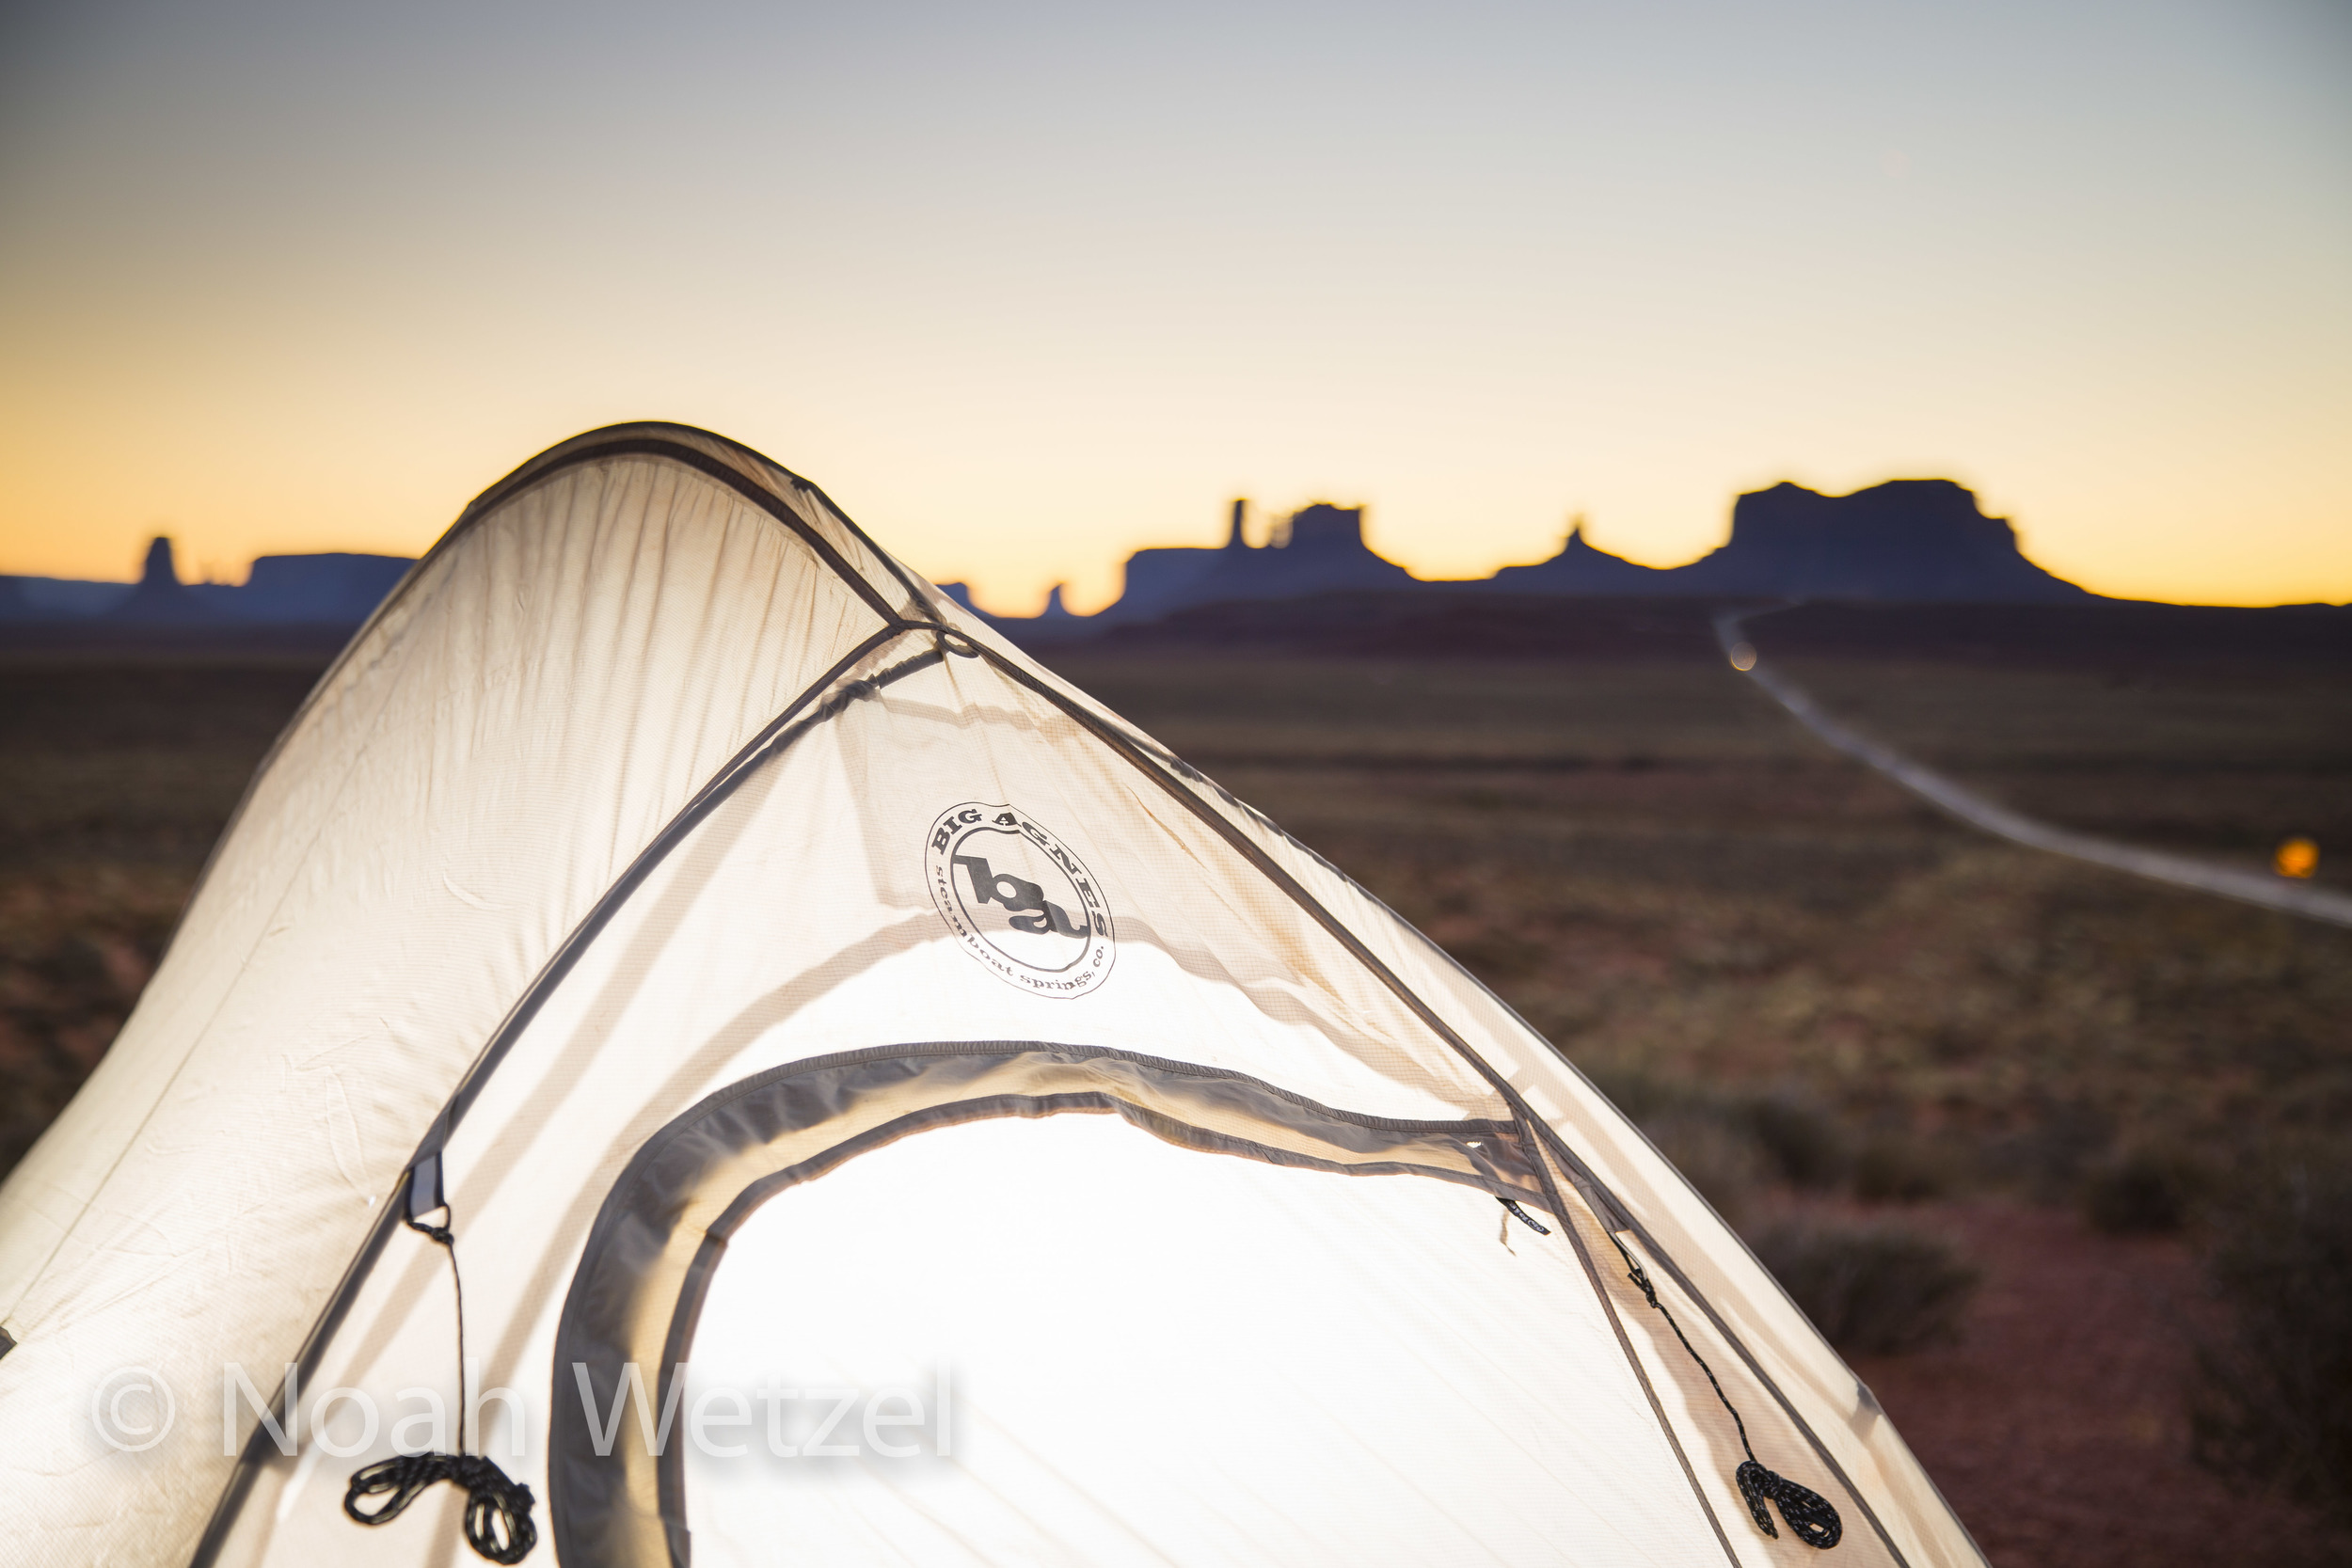 Big Agnes work in Monument Valley, Arizona